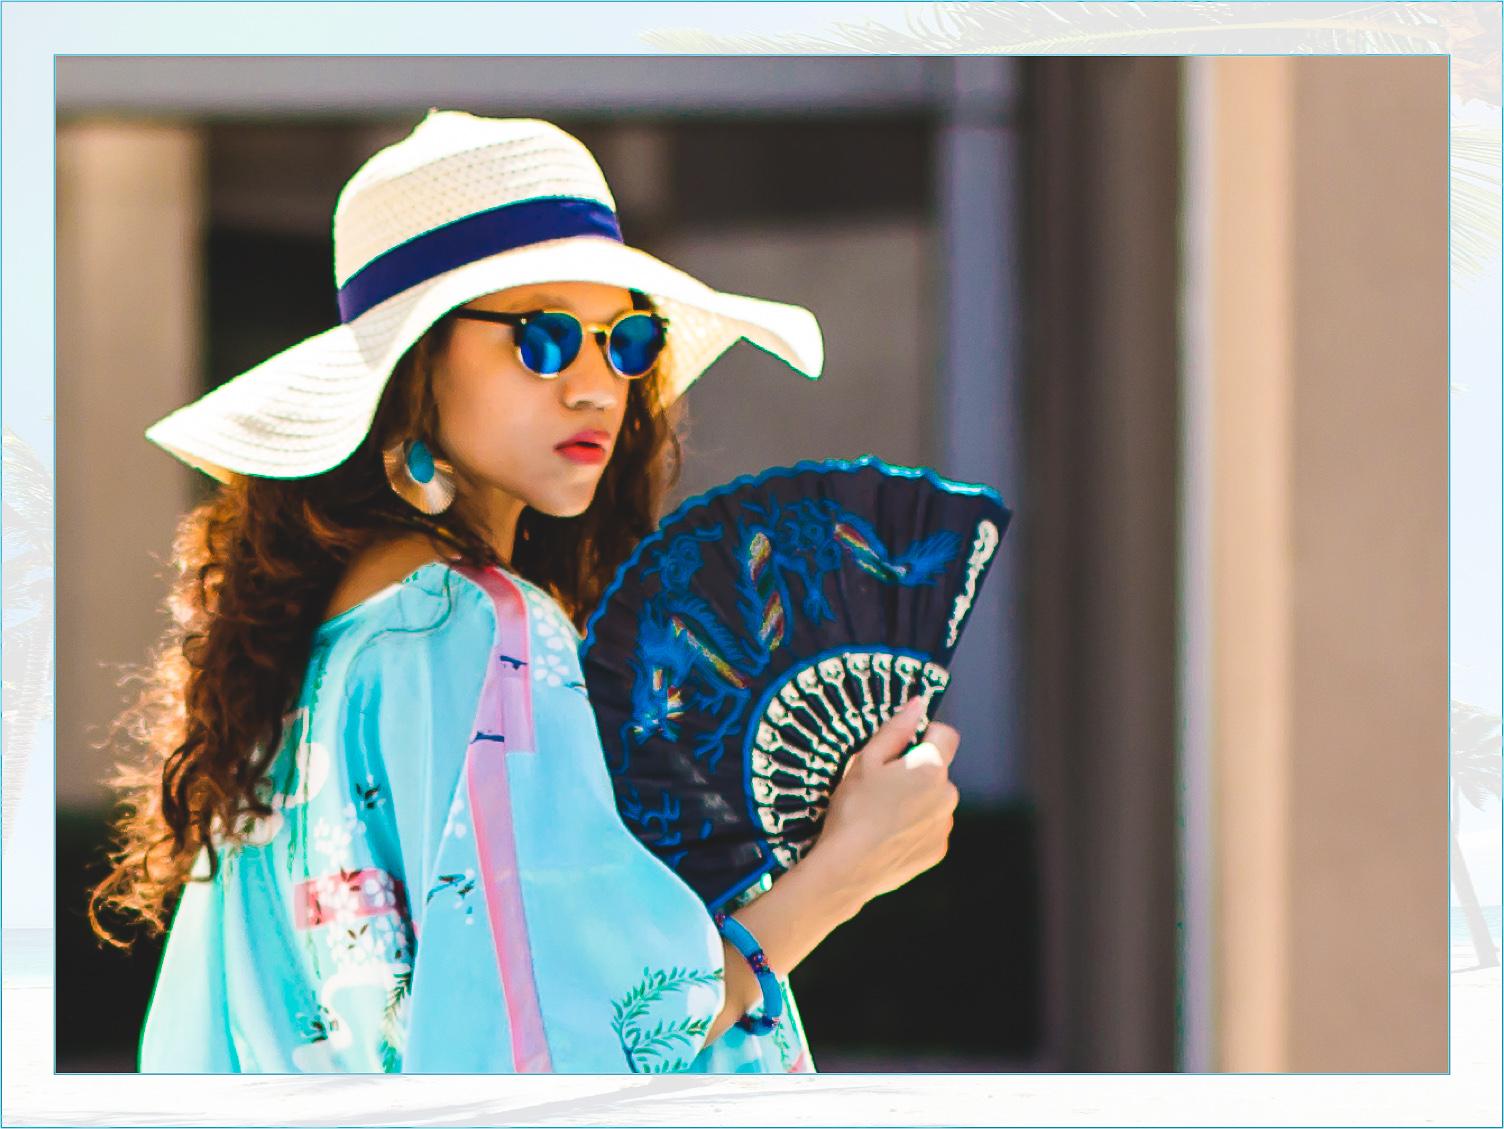 hotel-nikko-saigon_best-new-personal-style-blogs-2014_best-personal-style-bloggers-melbourne_international-bloggers-australia_exotic-fashion-bloggers-melbourne-australia_vietnamese_fashion-bloggers_vietnam-fashion-editorials